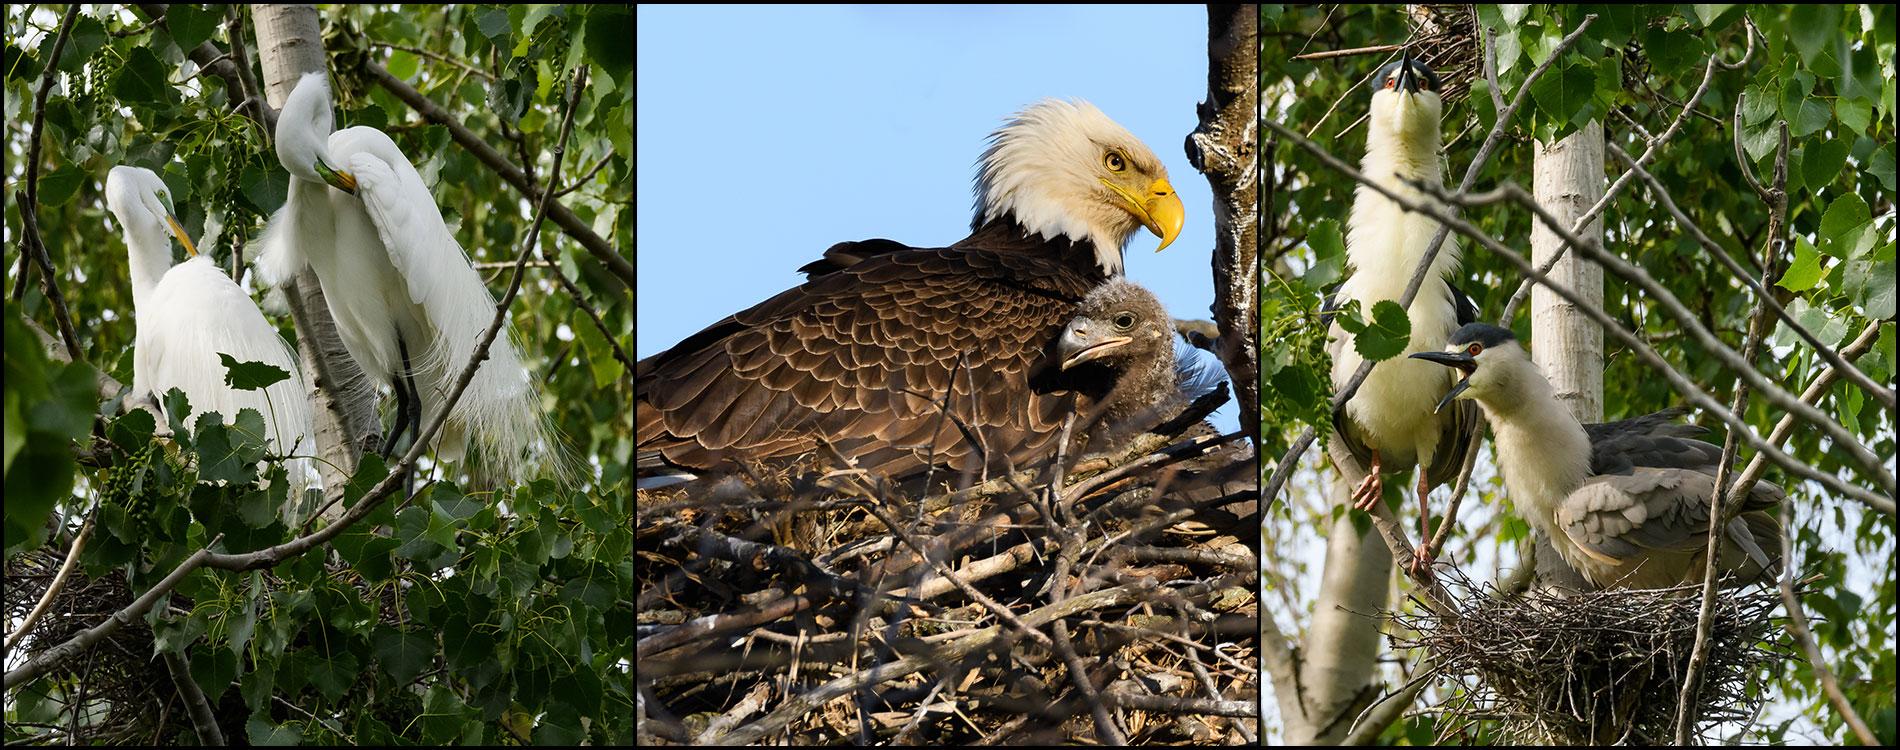 nesting_1900x750